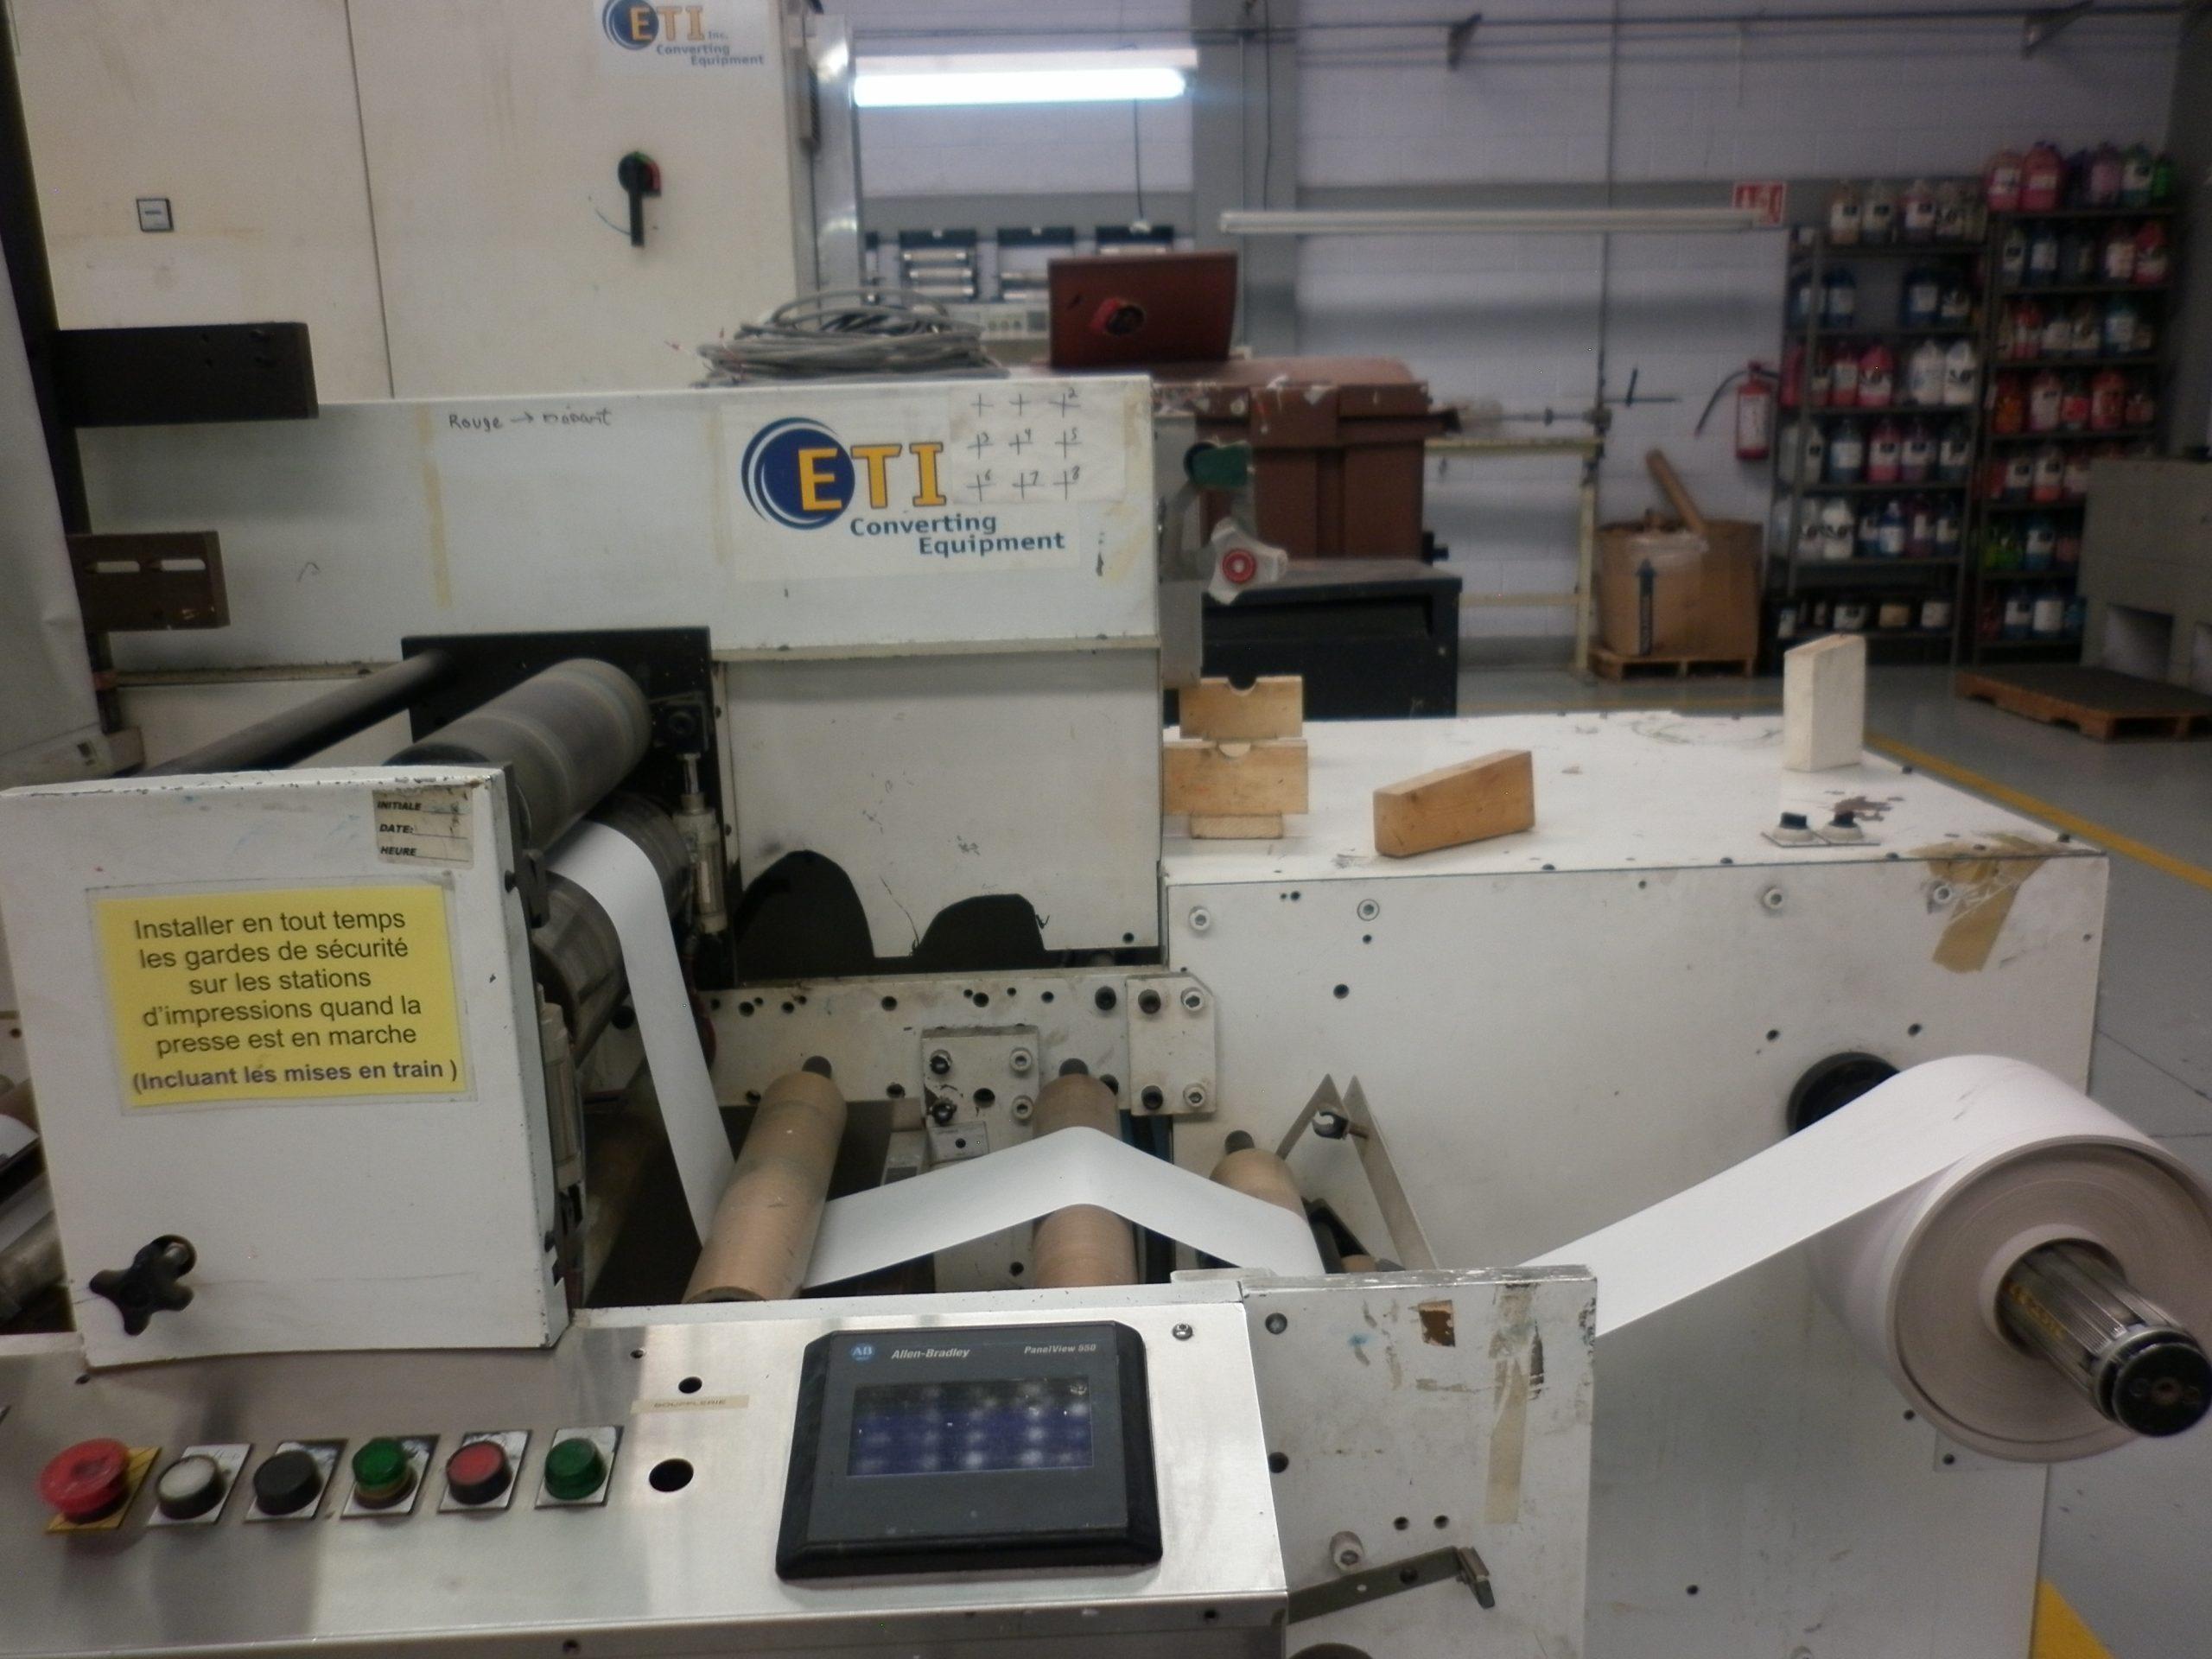 ETI Metronome - Used Flexo Printing Presses and Used Flexographic Equipment-2